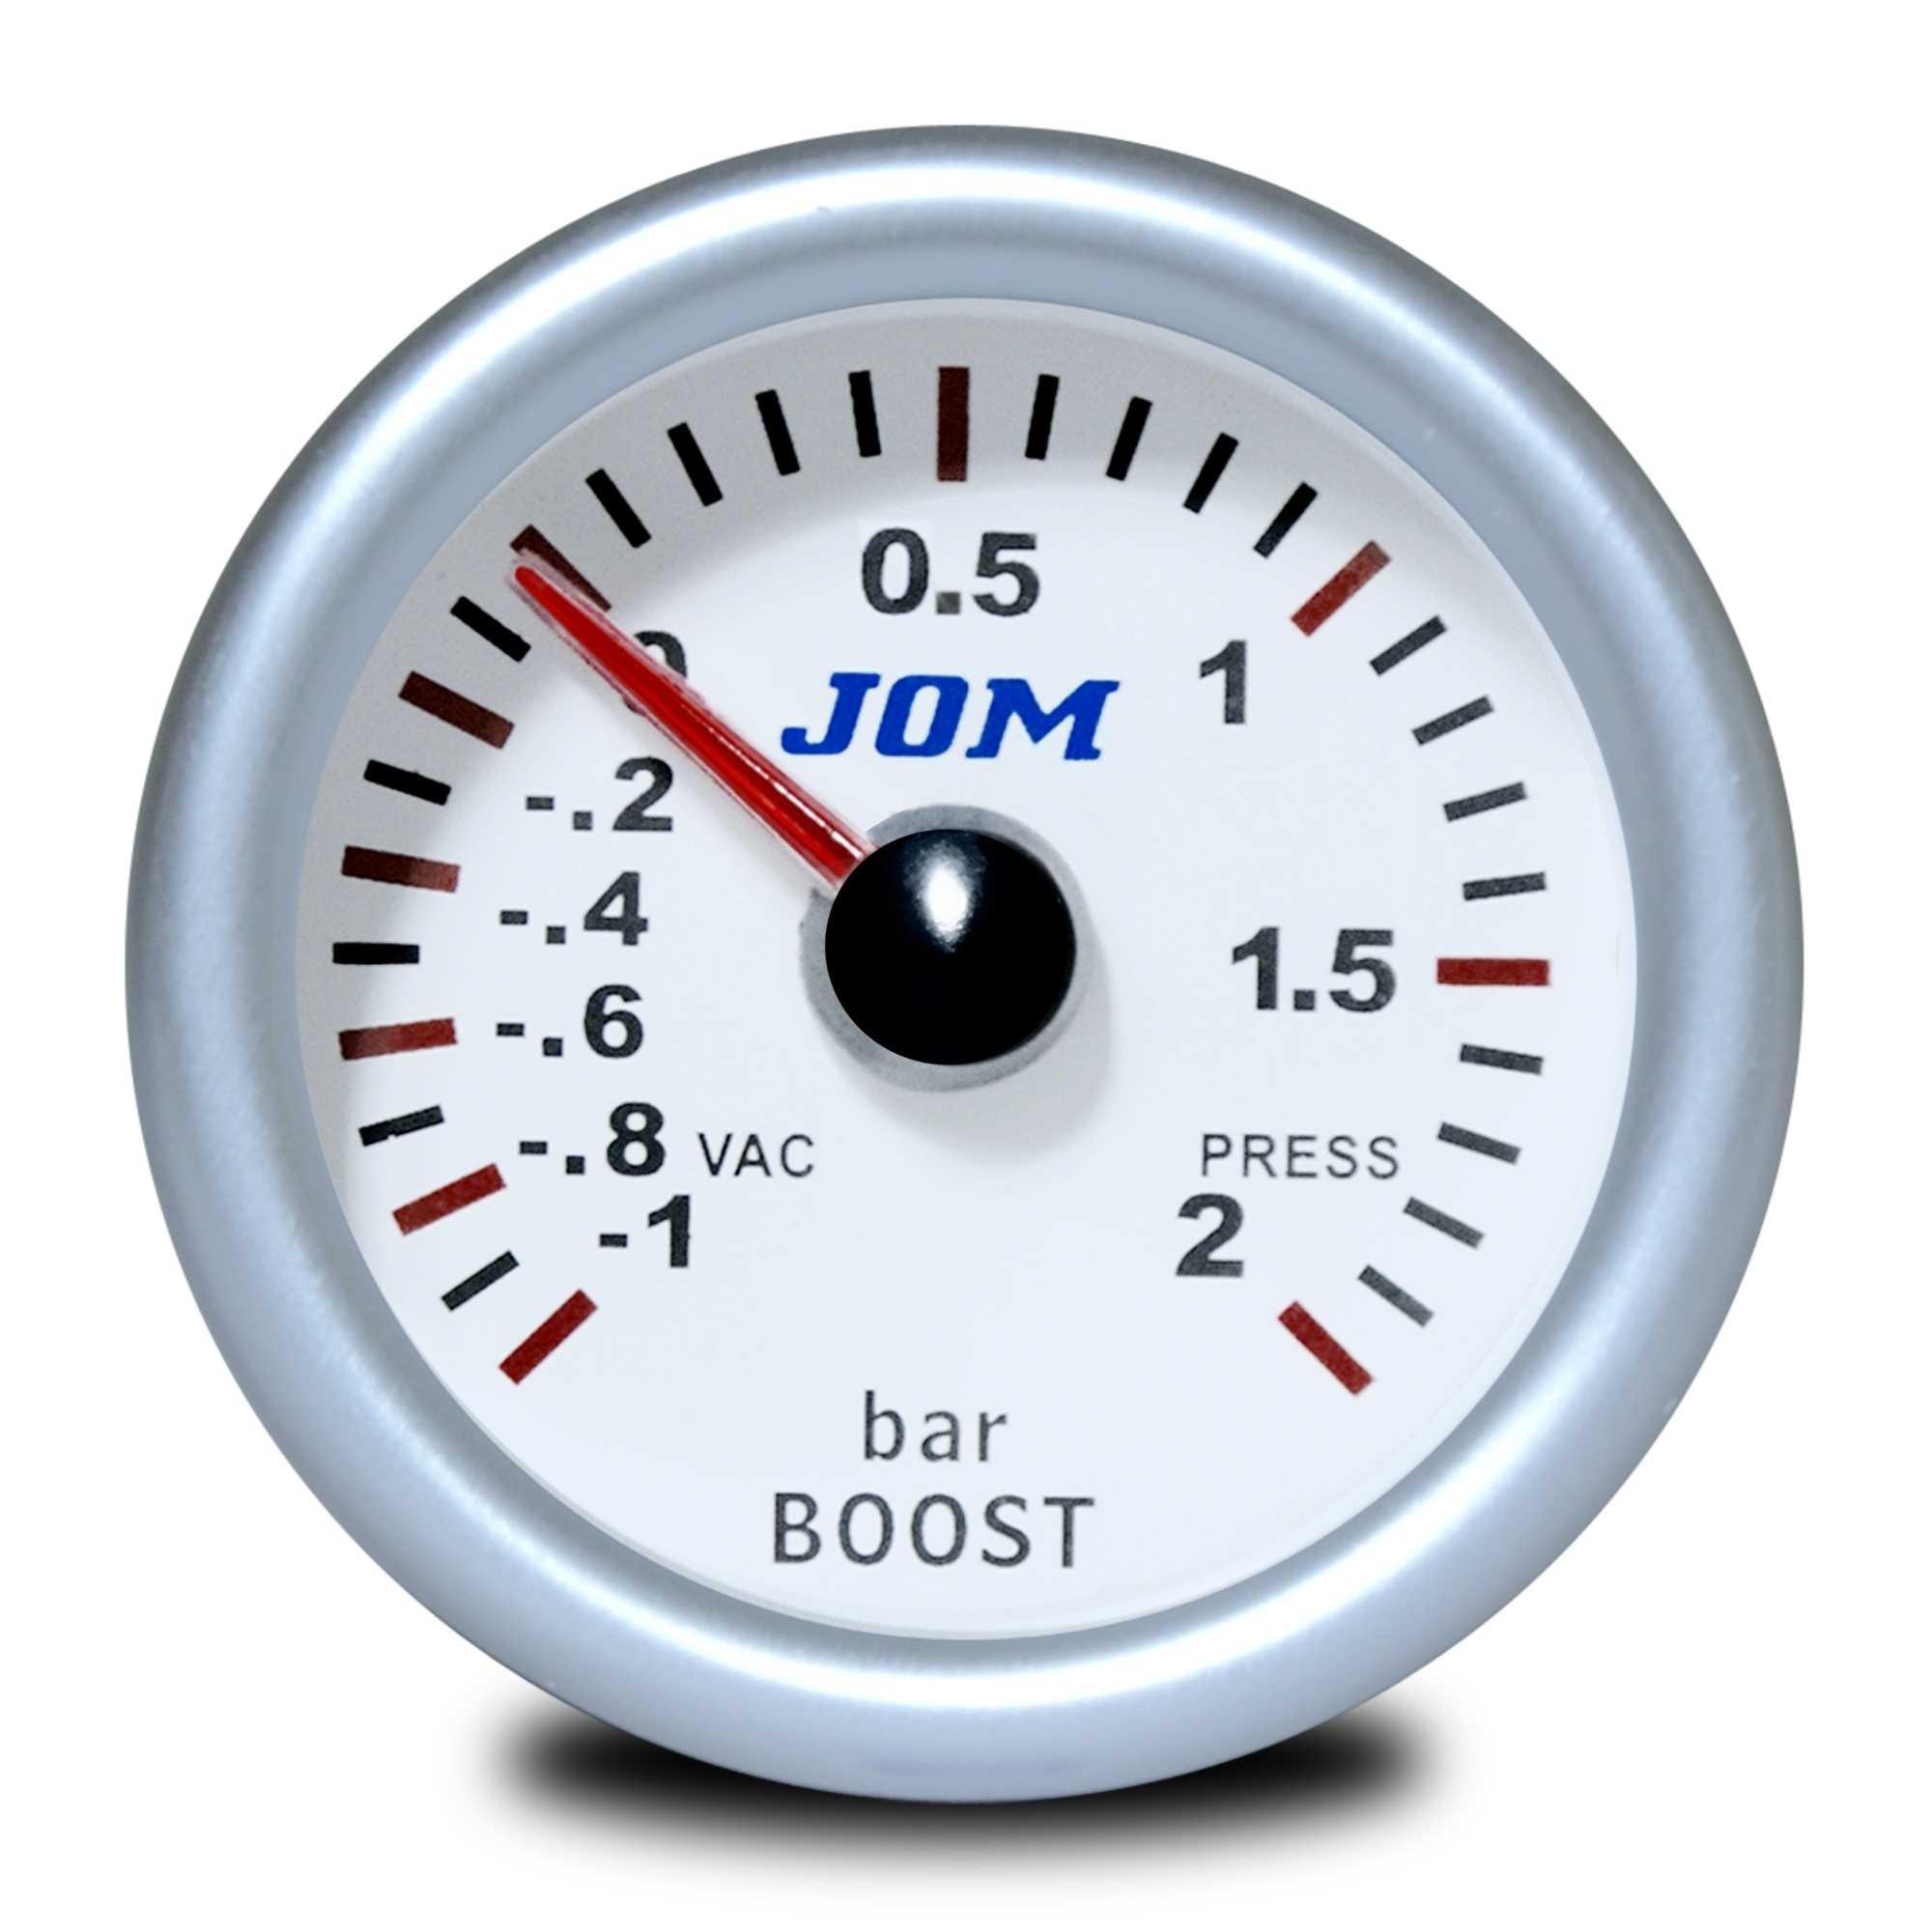 JOM palubní přístroj - tlak turba s bílým podkladem (Tlak turba)